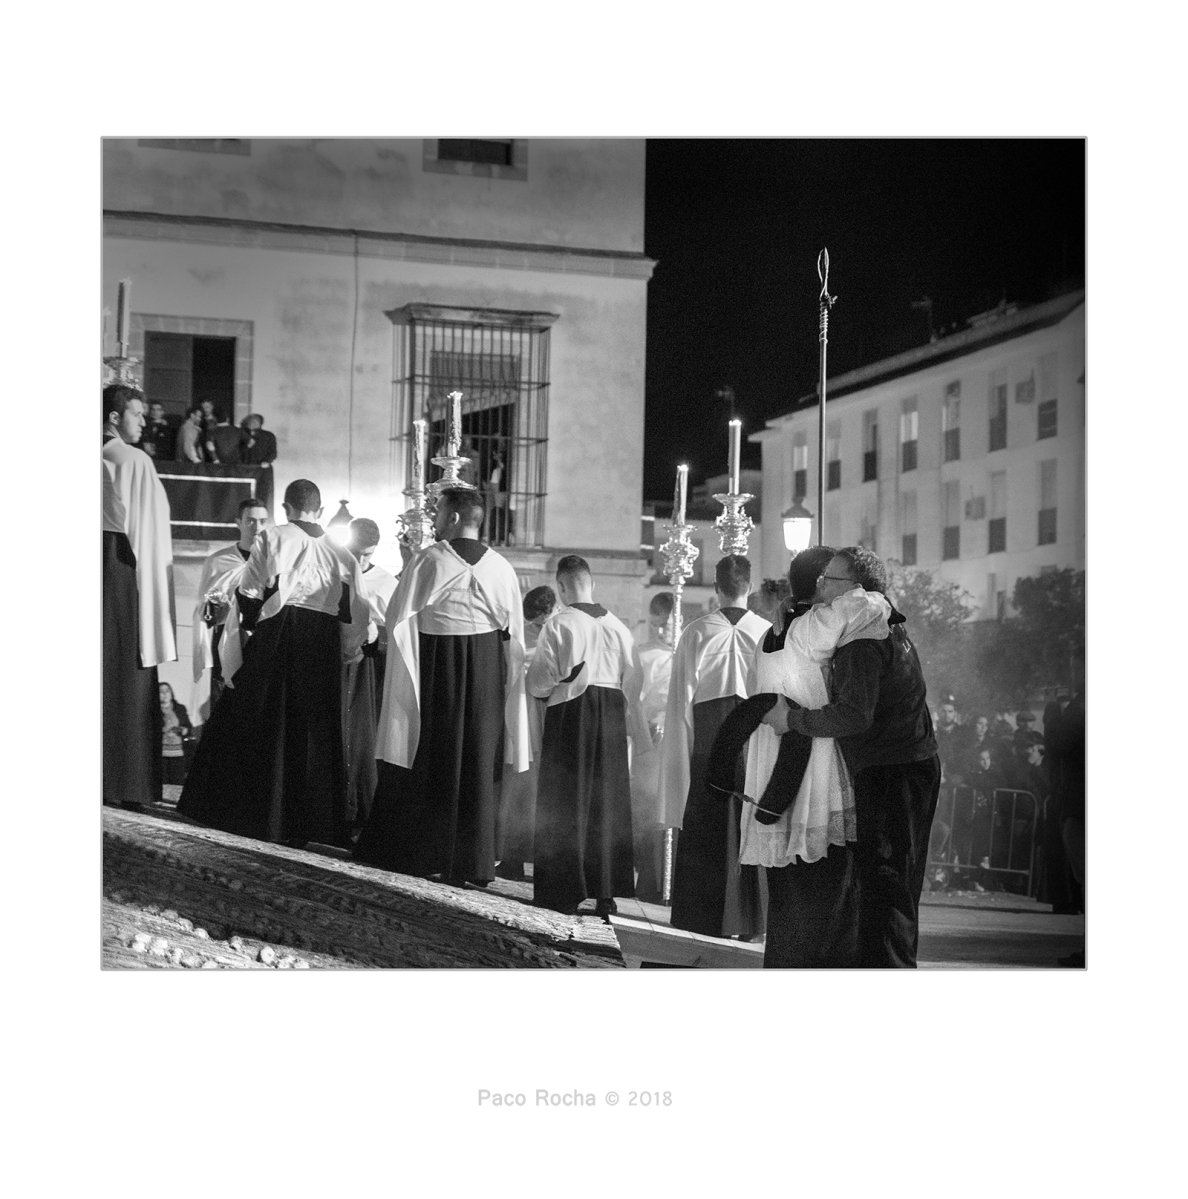 semana santa jerez paco rocha tercero efe terceroefe penitentes pasos cristos virgen